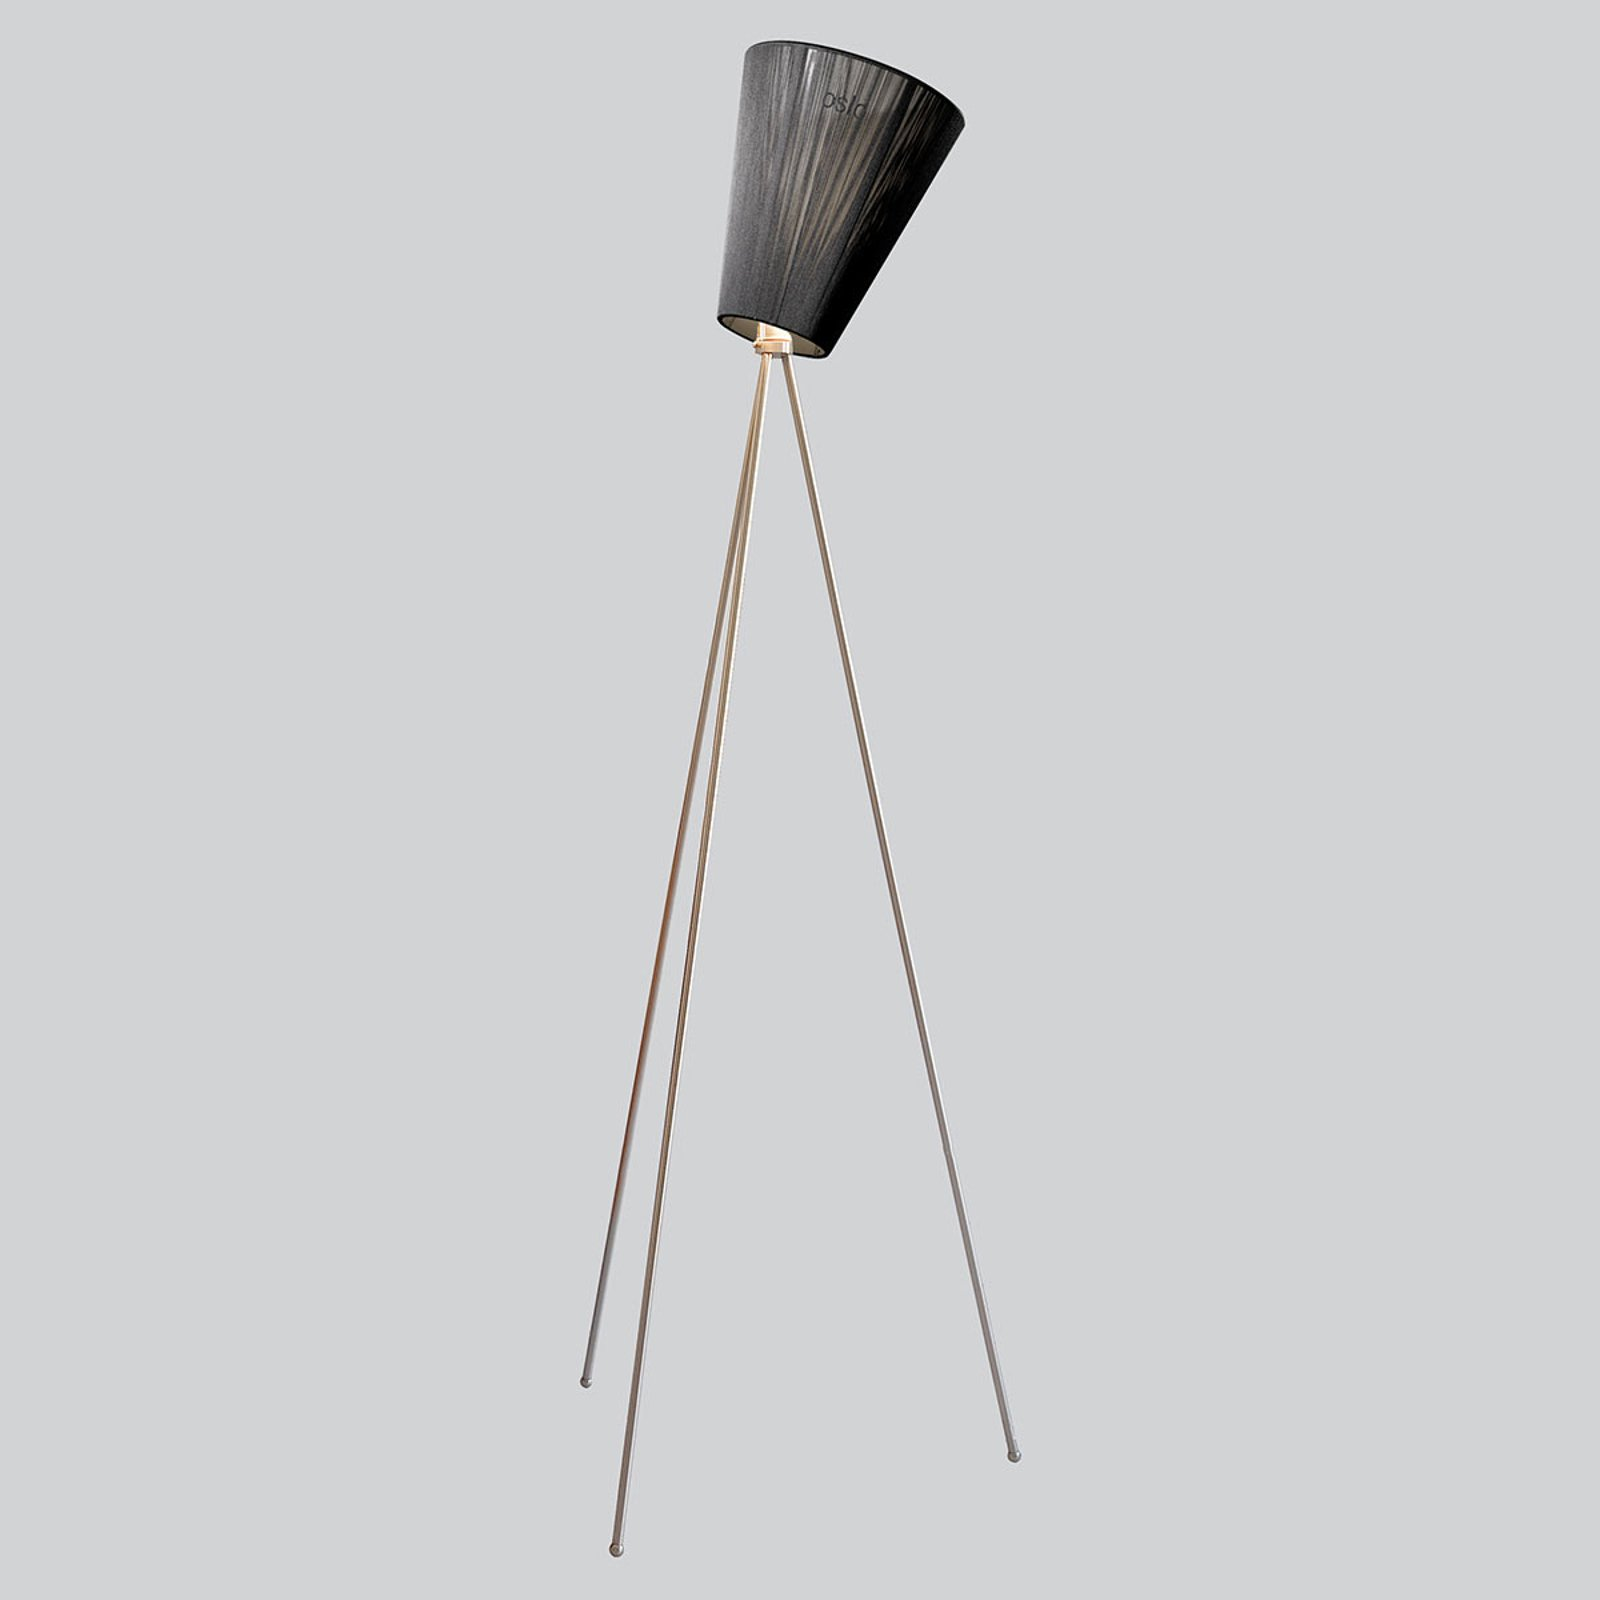 Northern Oslo Wood gulvlampe, stål/svart